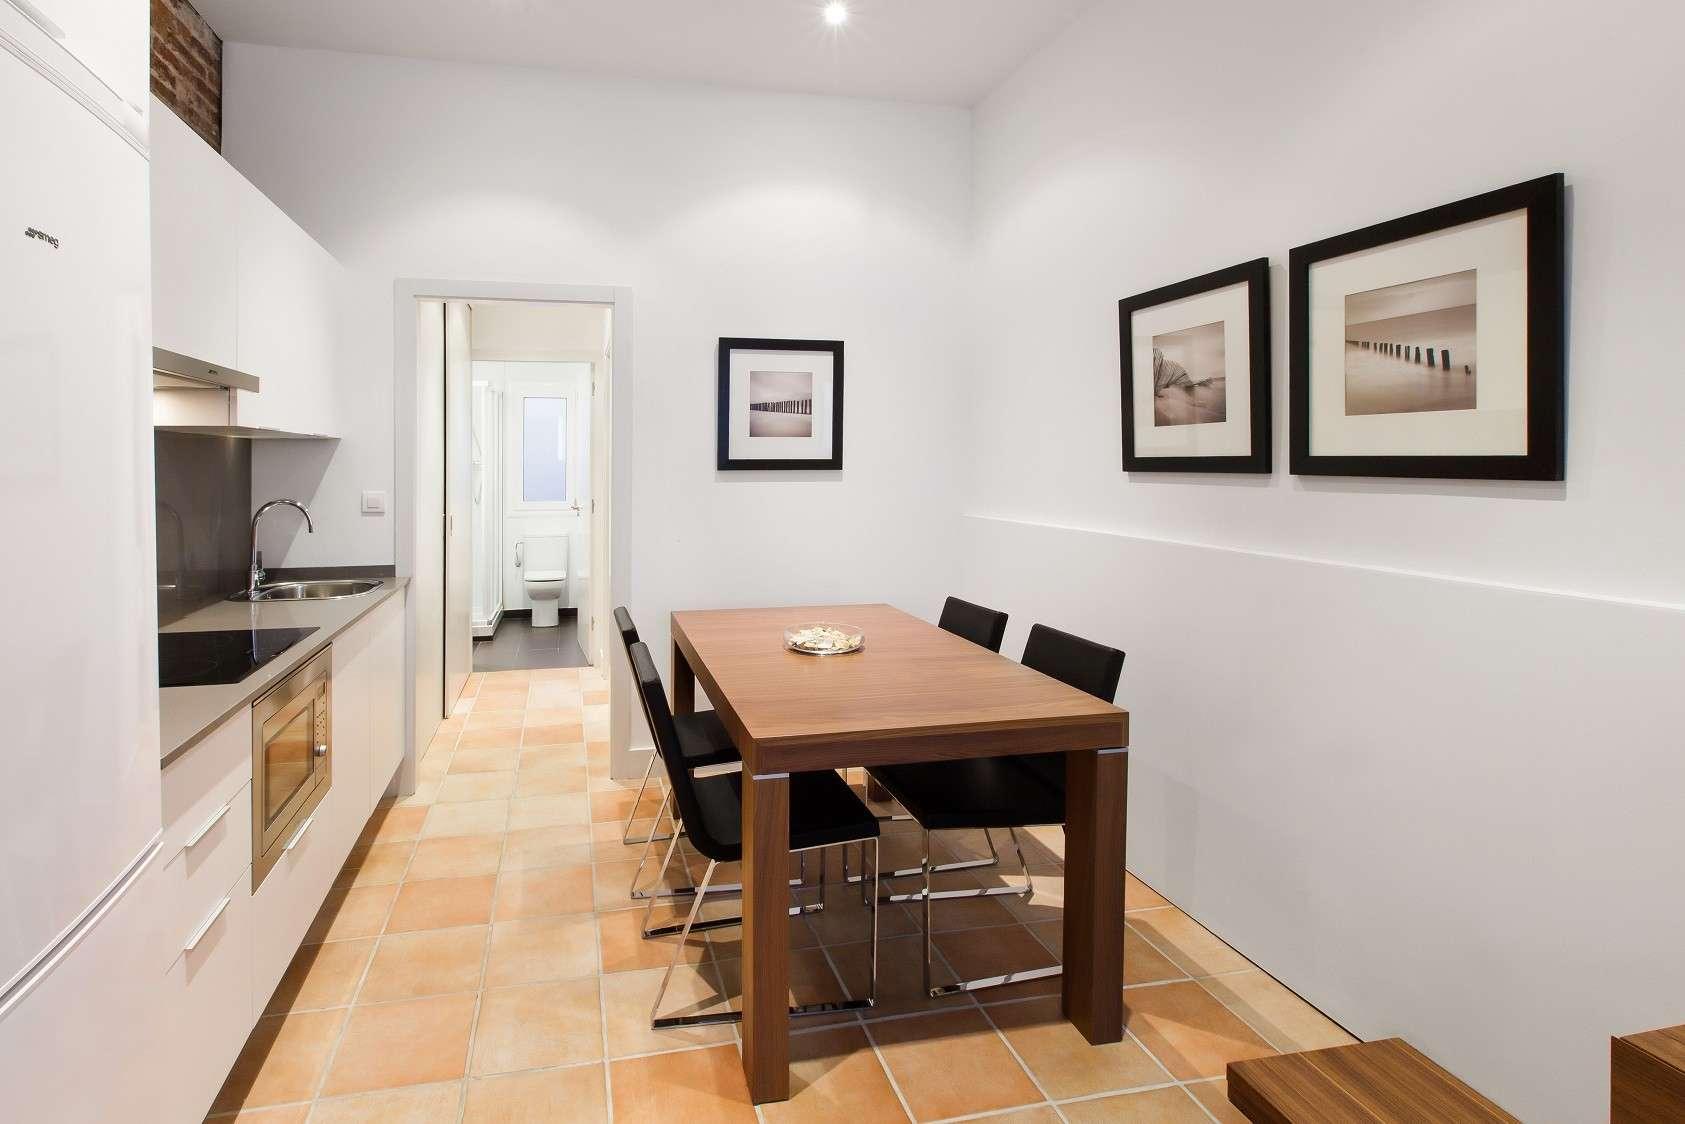 Dailyflats Sagrada Familia area Classic 1-bedroom (1-4 adults) apartments in Barcelona 9